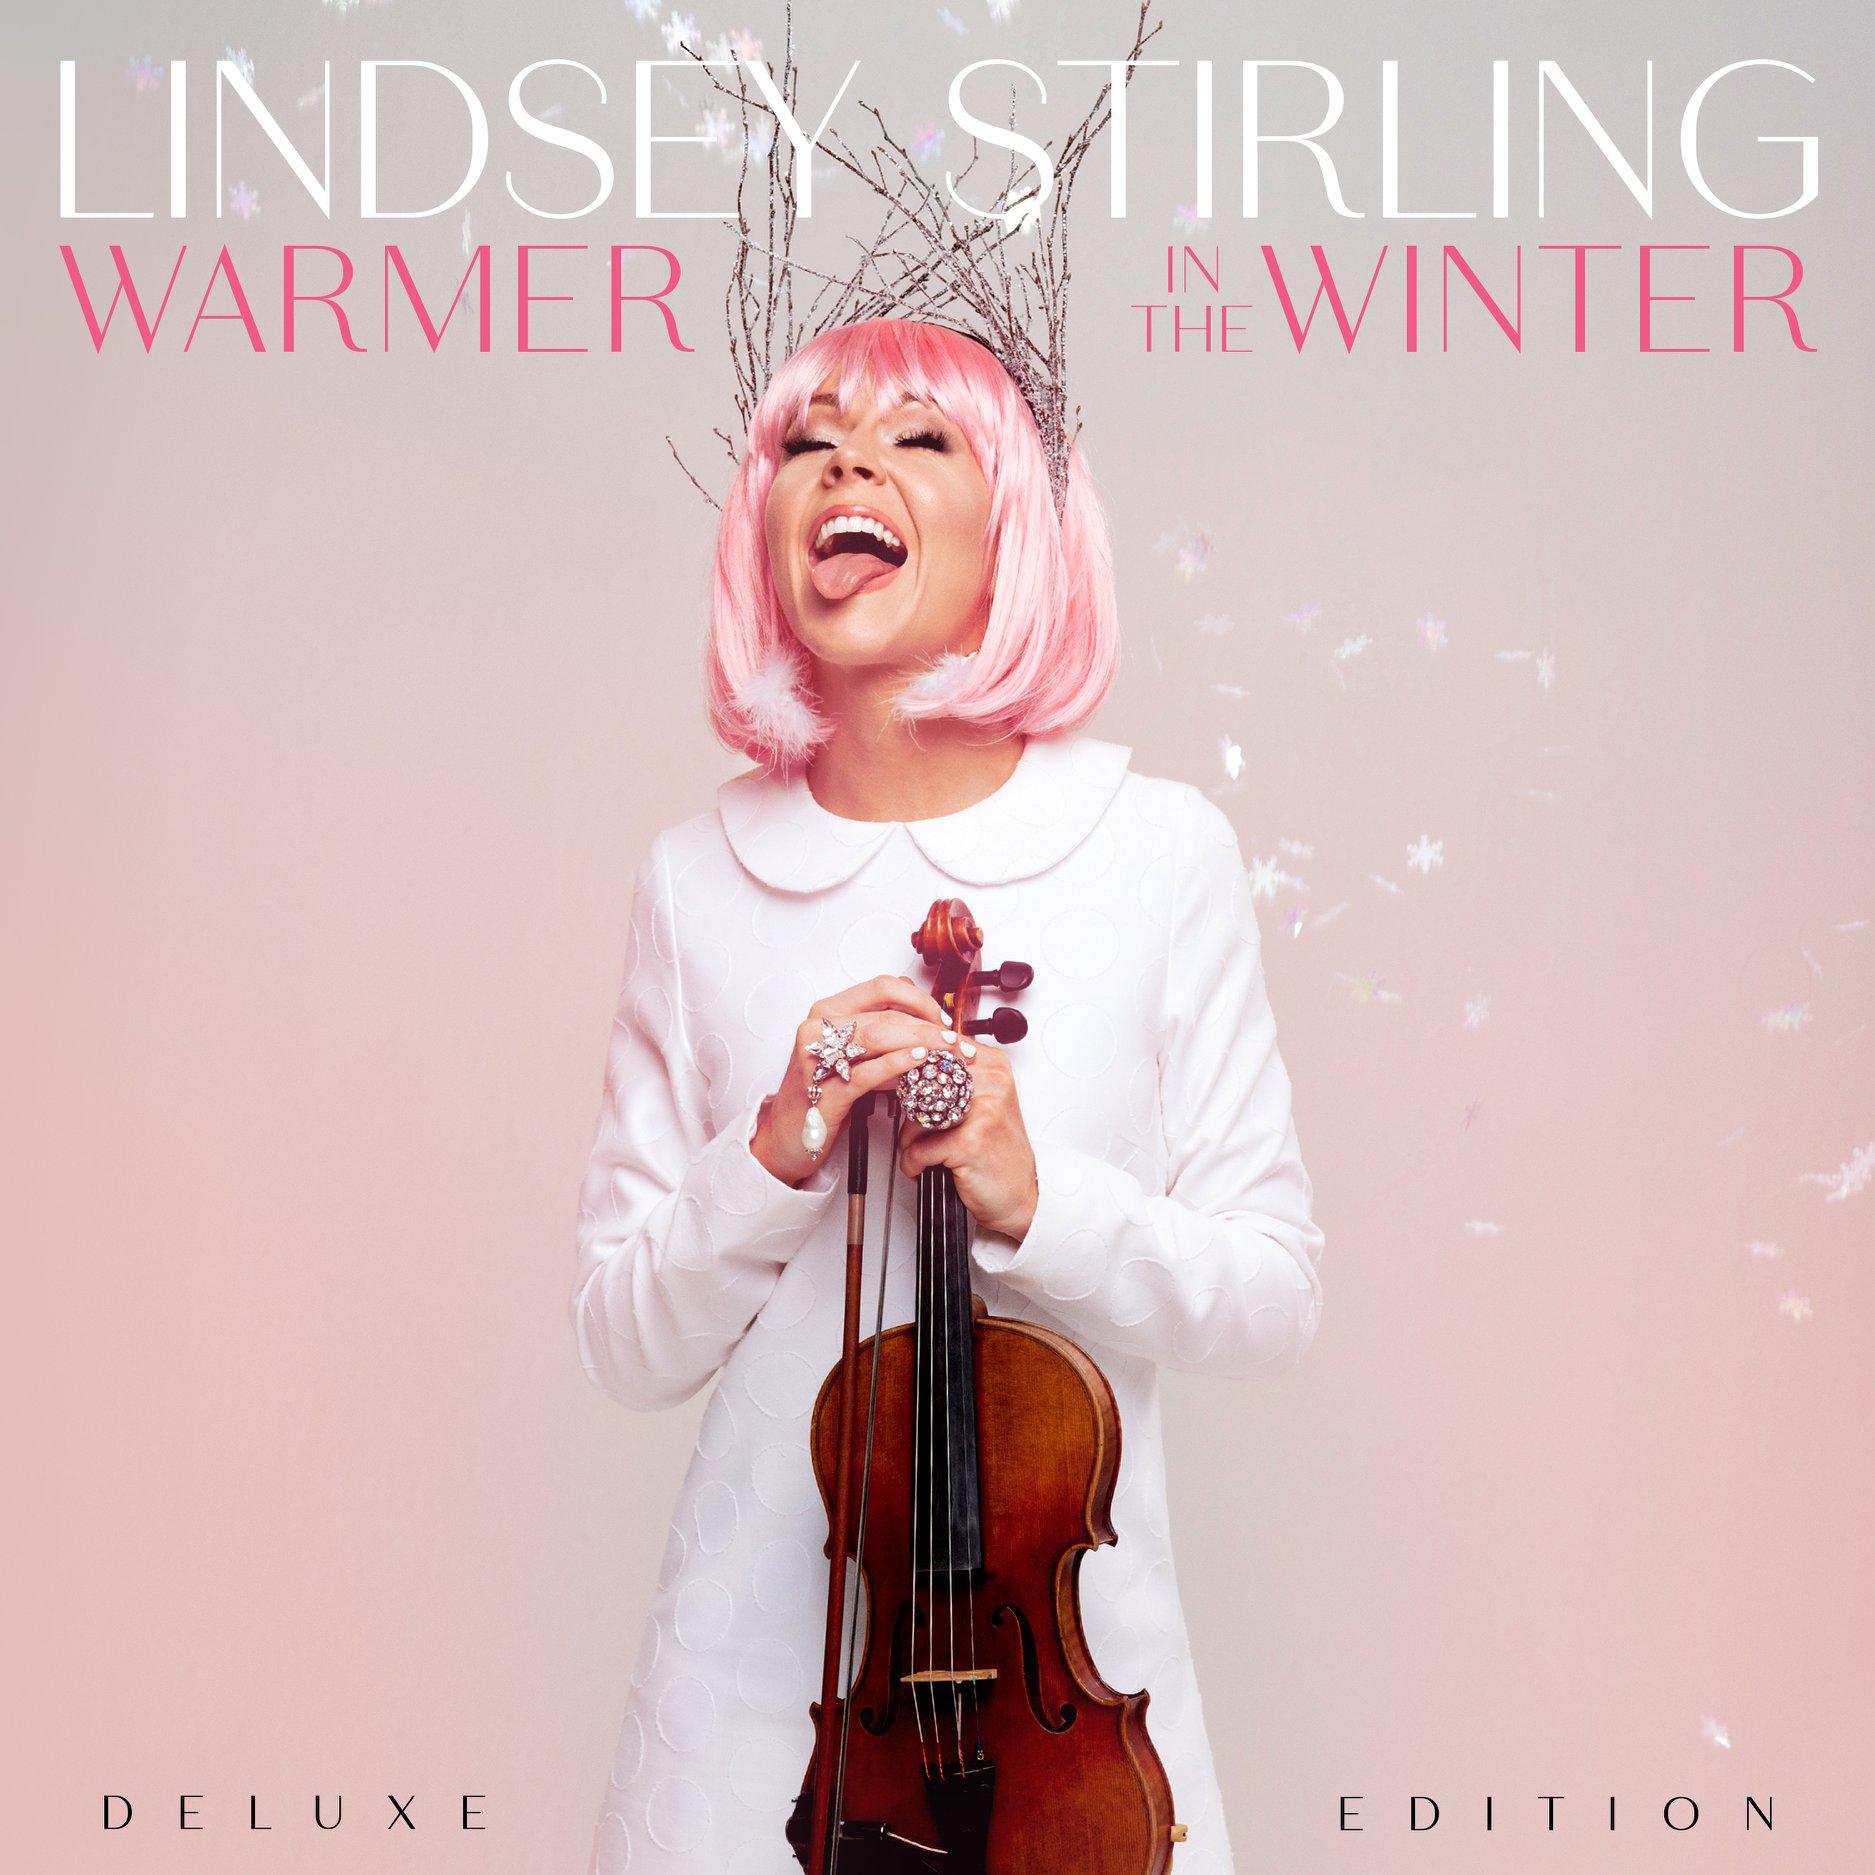 Lindsey-Stirling-Warmer-In-The-Winter.jpg